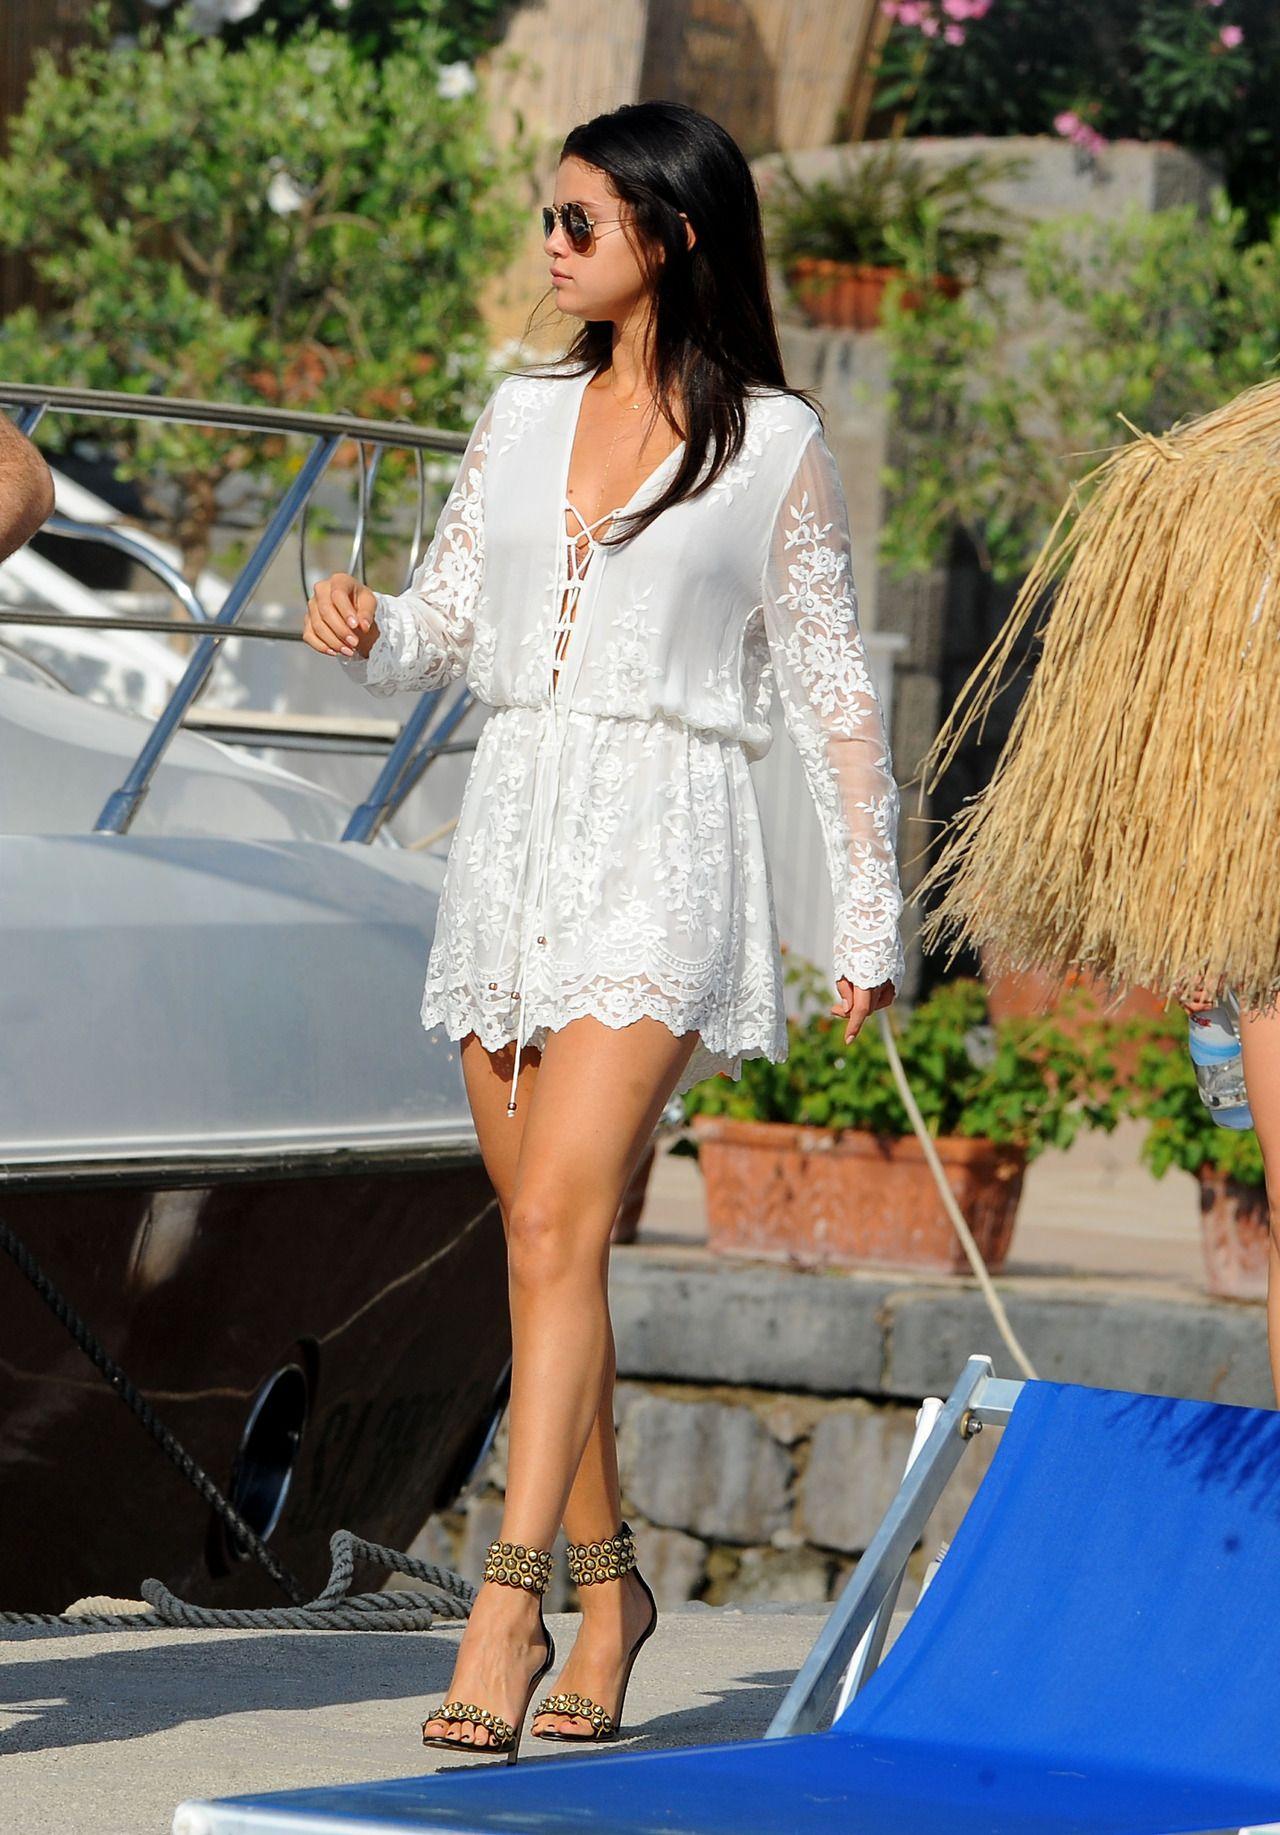 2014 > Leaving Ischia